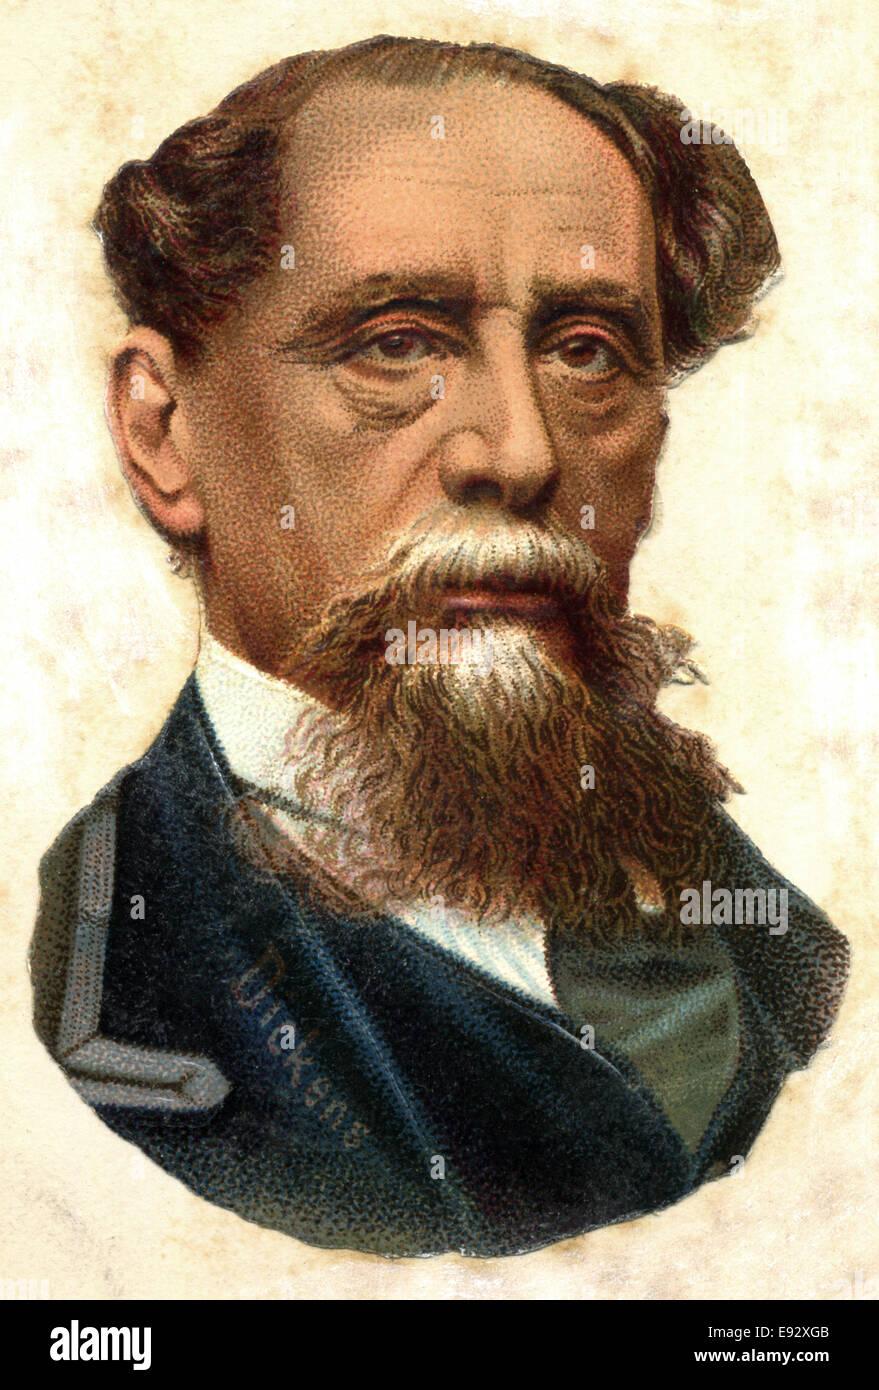 Charles Dickens (1812-1870), English Writer, Portrait Stock Photo